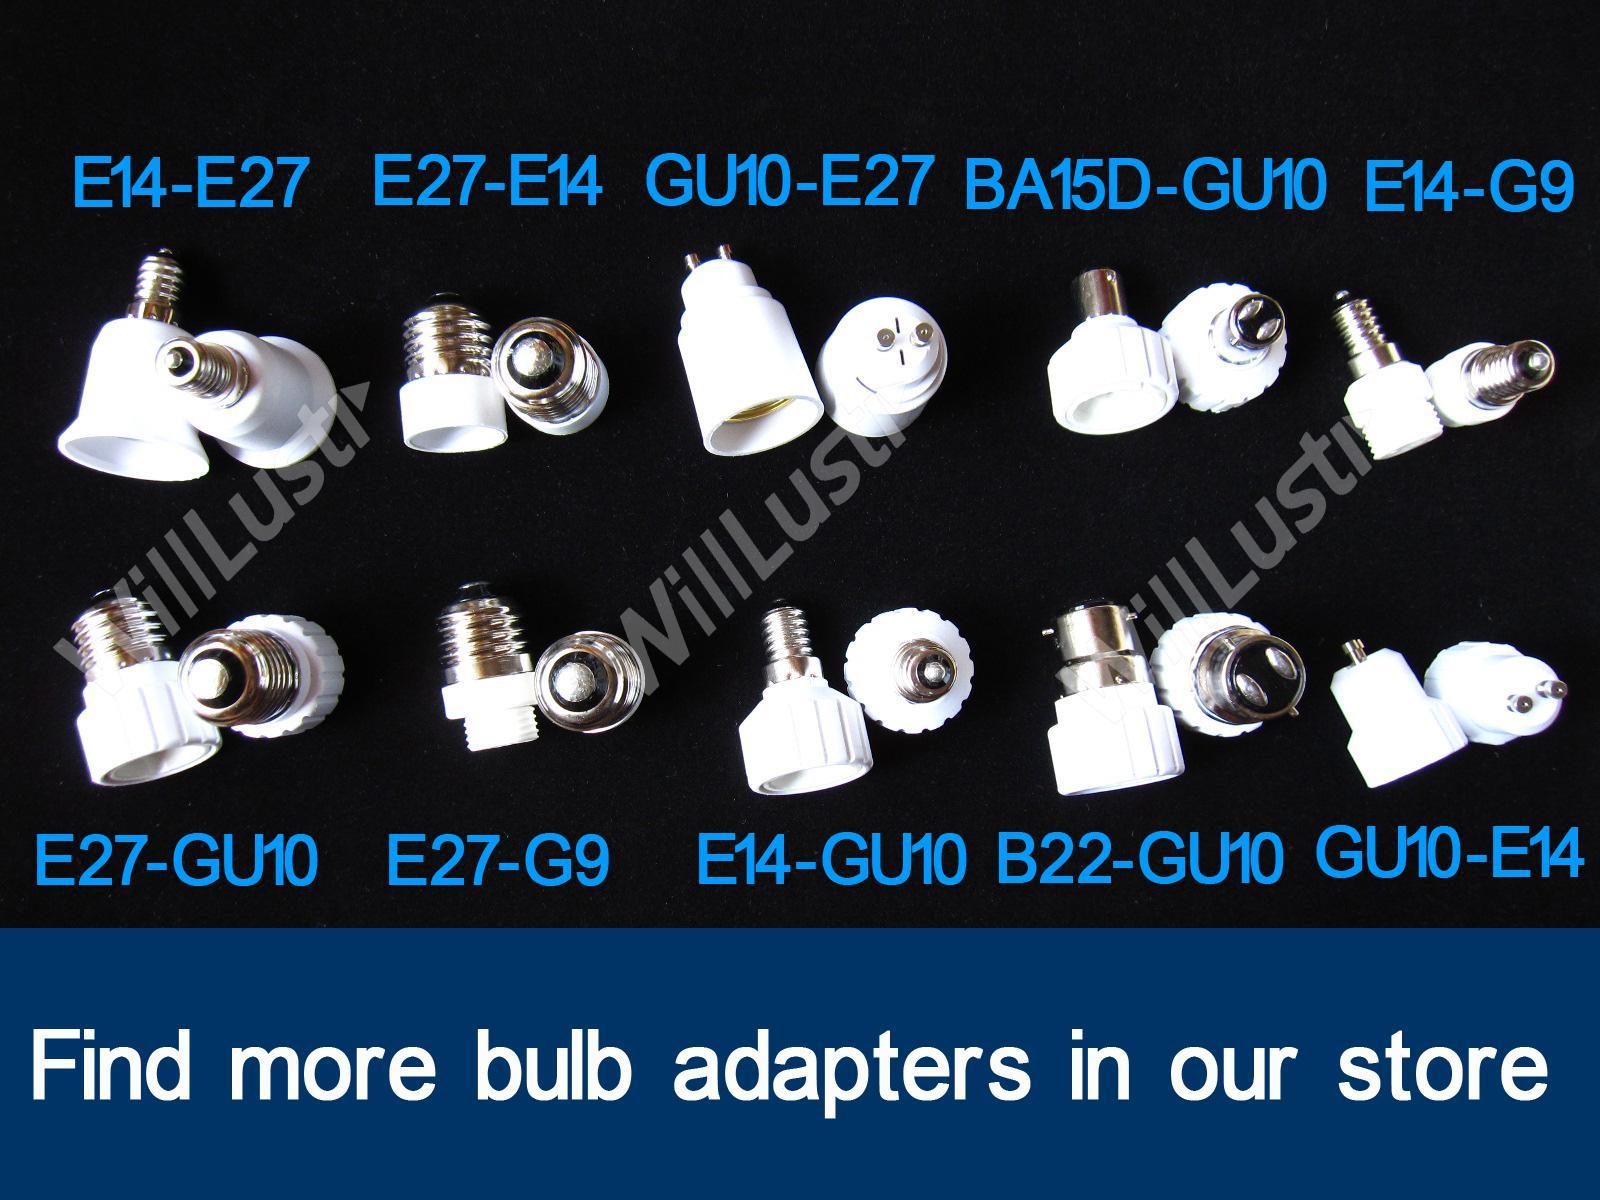 100 stks / partij FEDEX Gratis verzending B22 naar E27 Adapter LED-halogeen CFL-lichtlamp E27 naar B22 Adapter BC naar ES-adapter